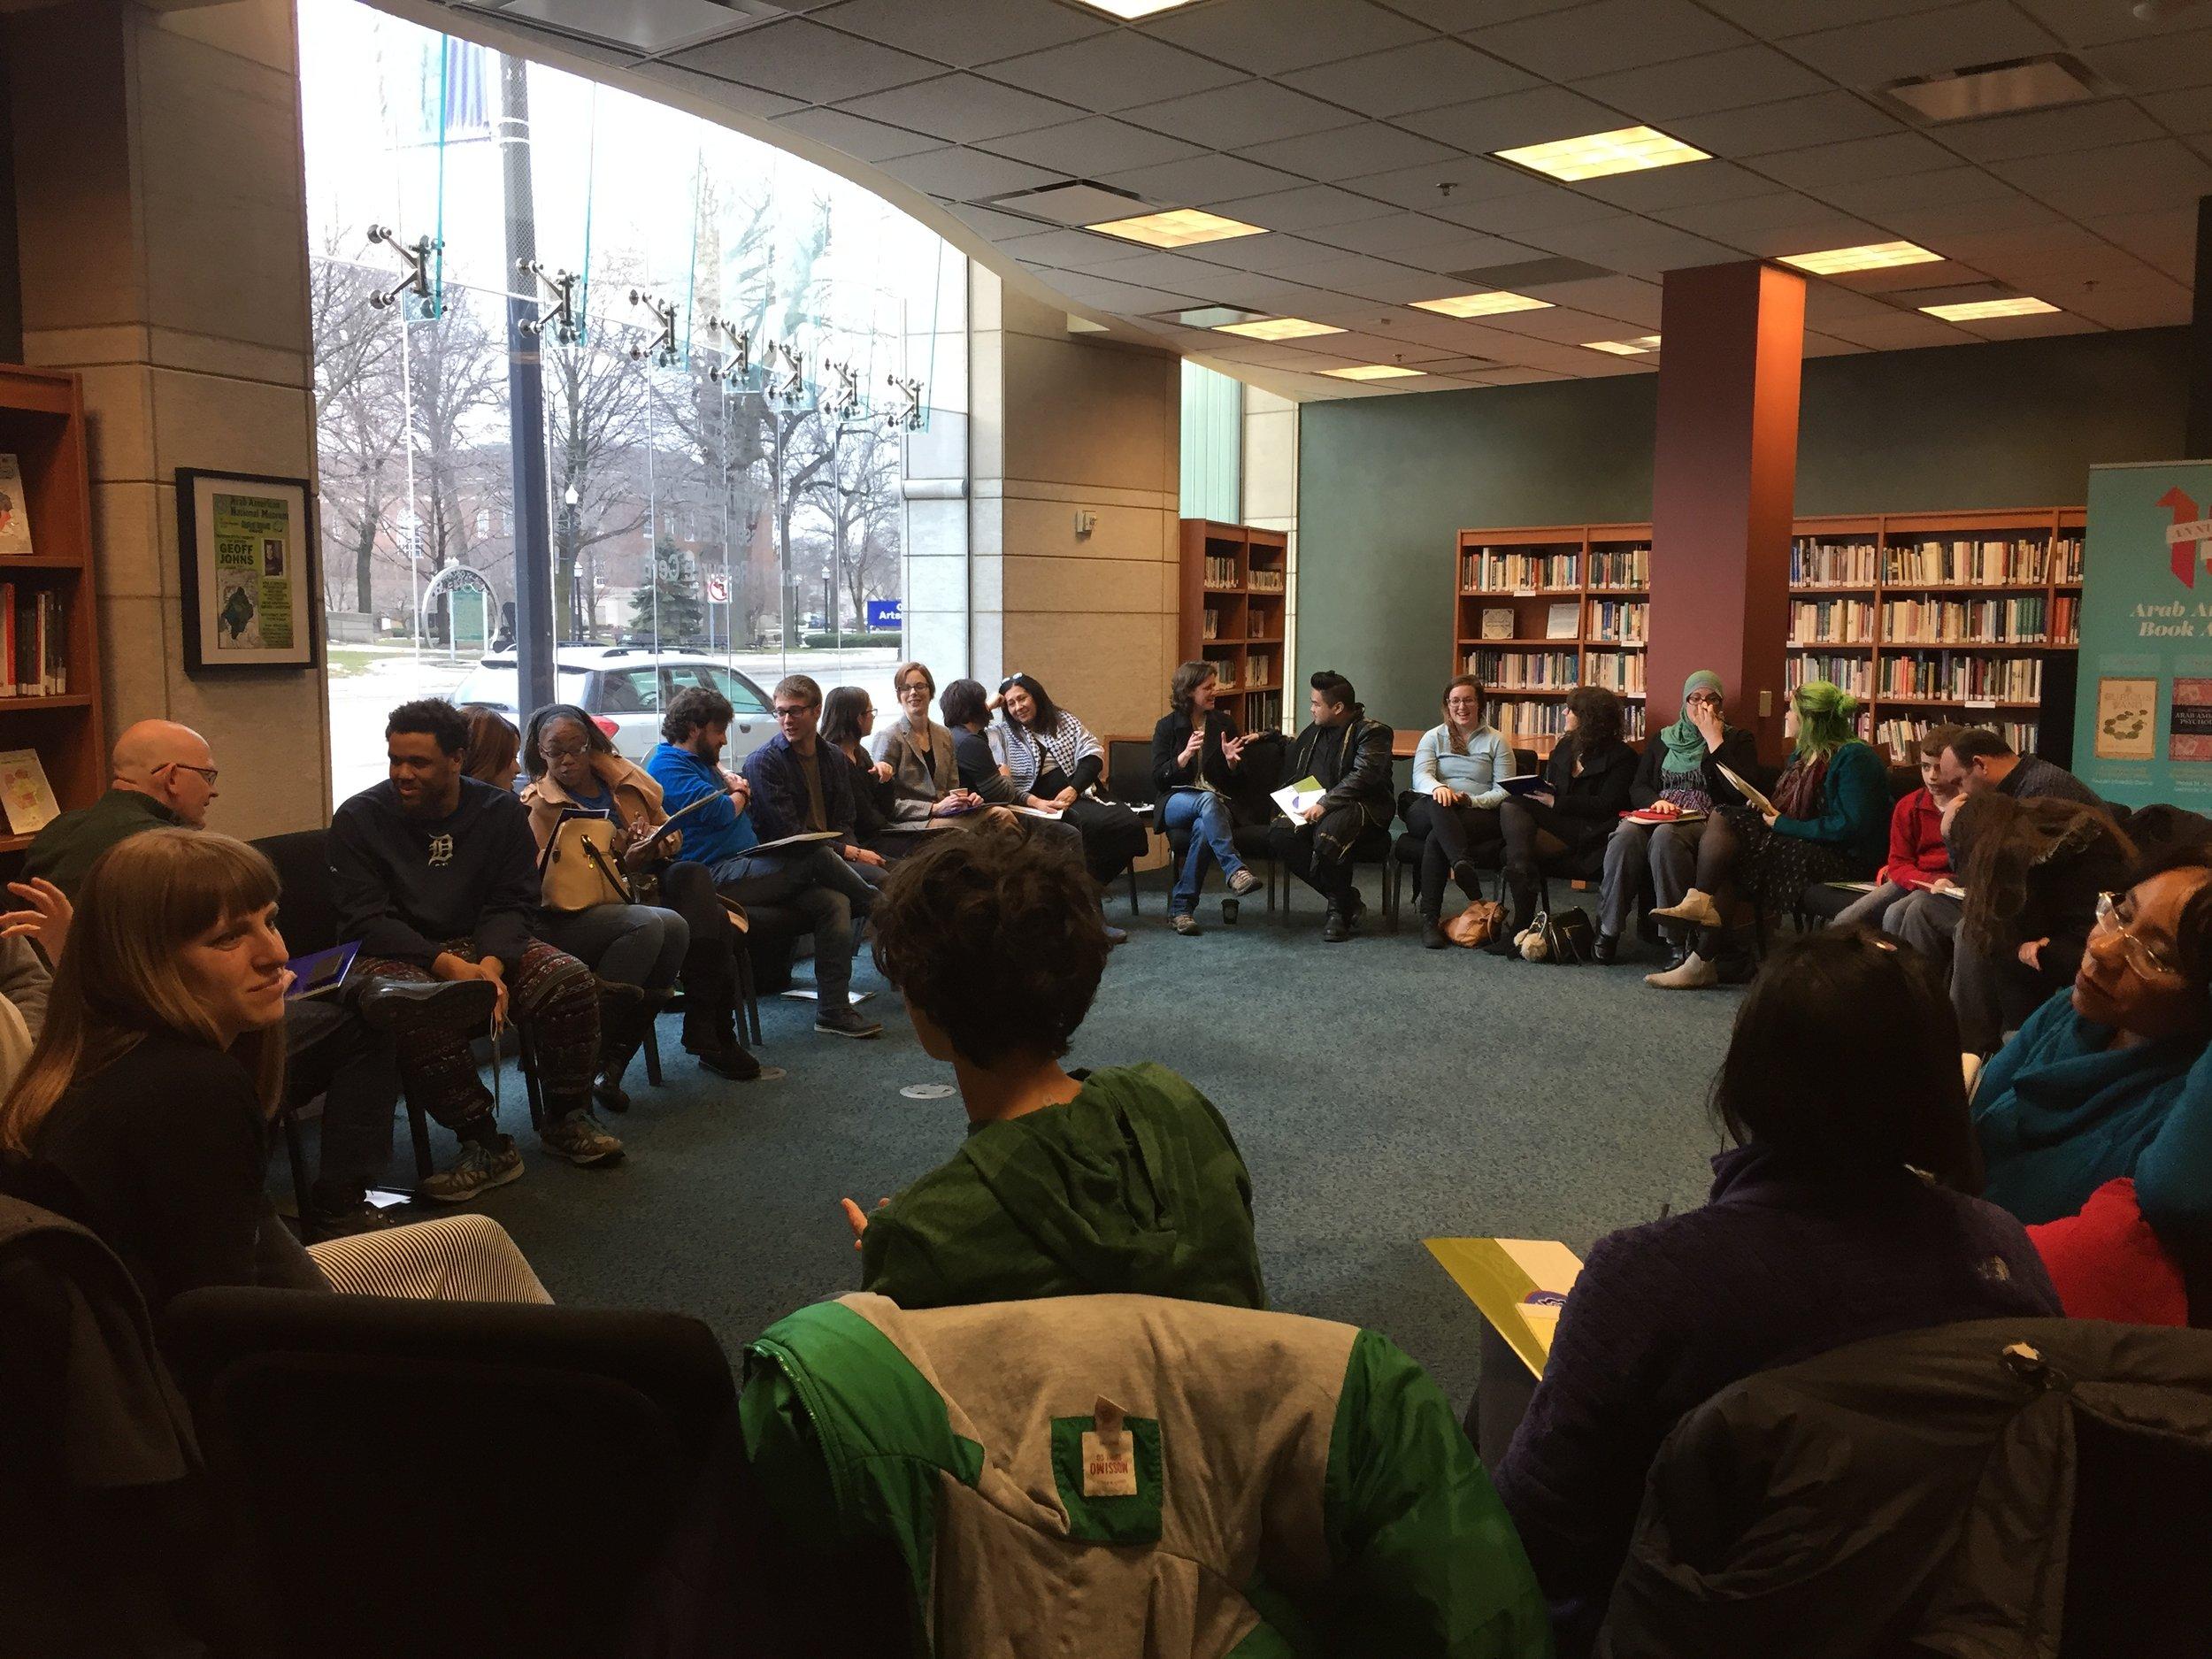 Hikayat: Storytelling WorkshopMarch 18, 2017, Arab American National MuseumDearborn, MIIn collaboration with the Arab American National Museum. - Storytelling workshop led by Nadia Abuelezam for 32 storytellers.